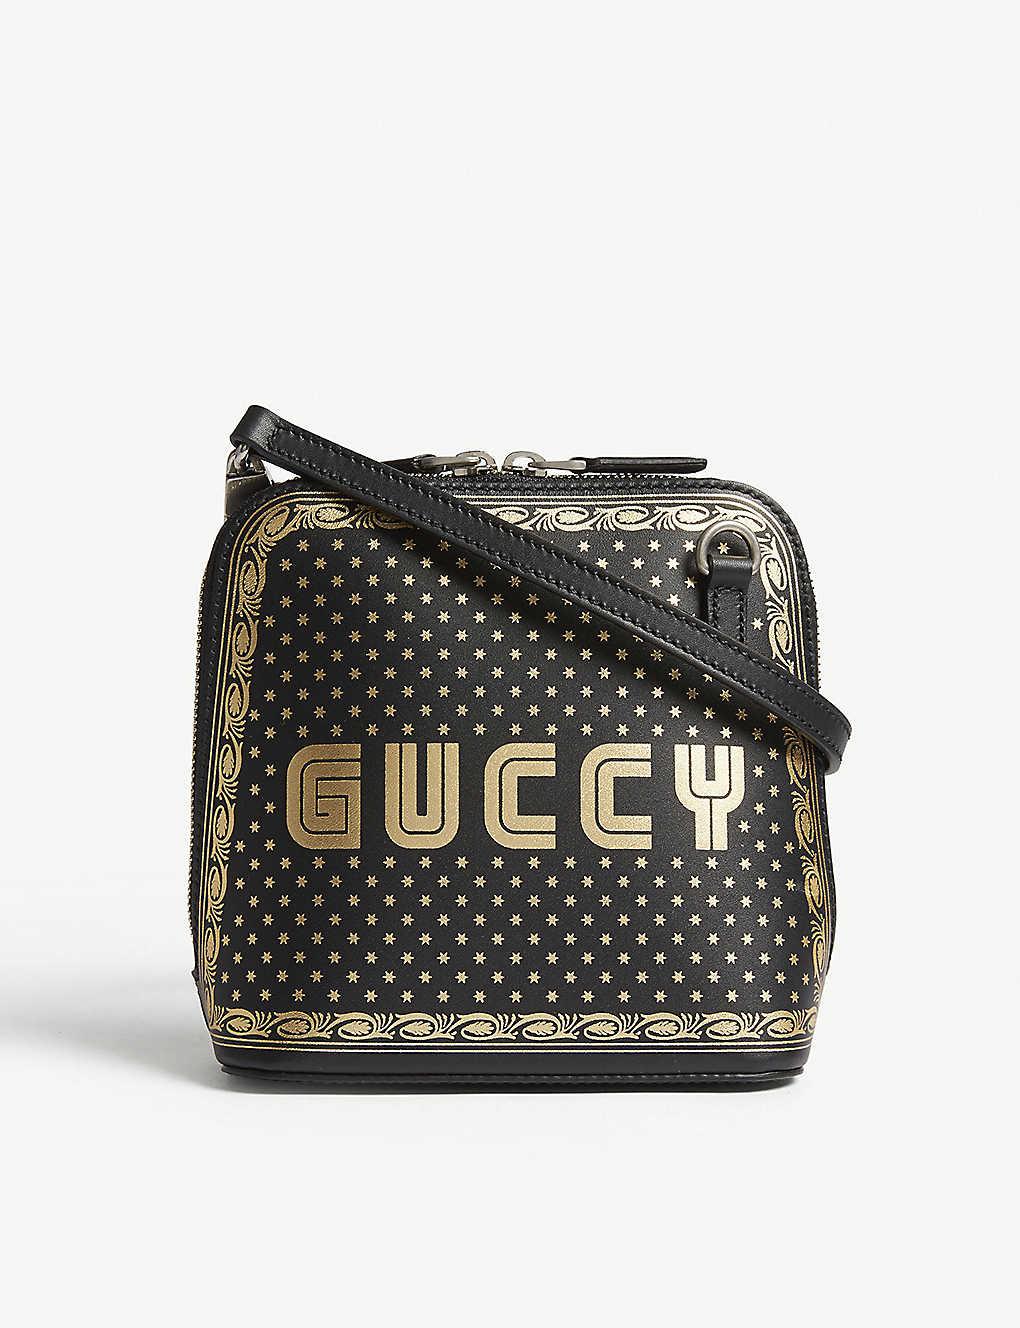 0727f6abb7a GUCCI - Guccy mini leather shoulder bag